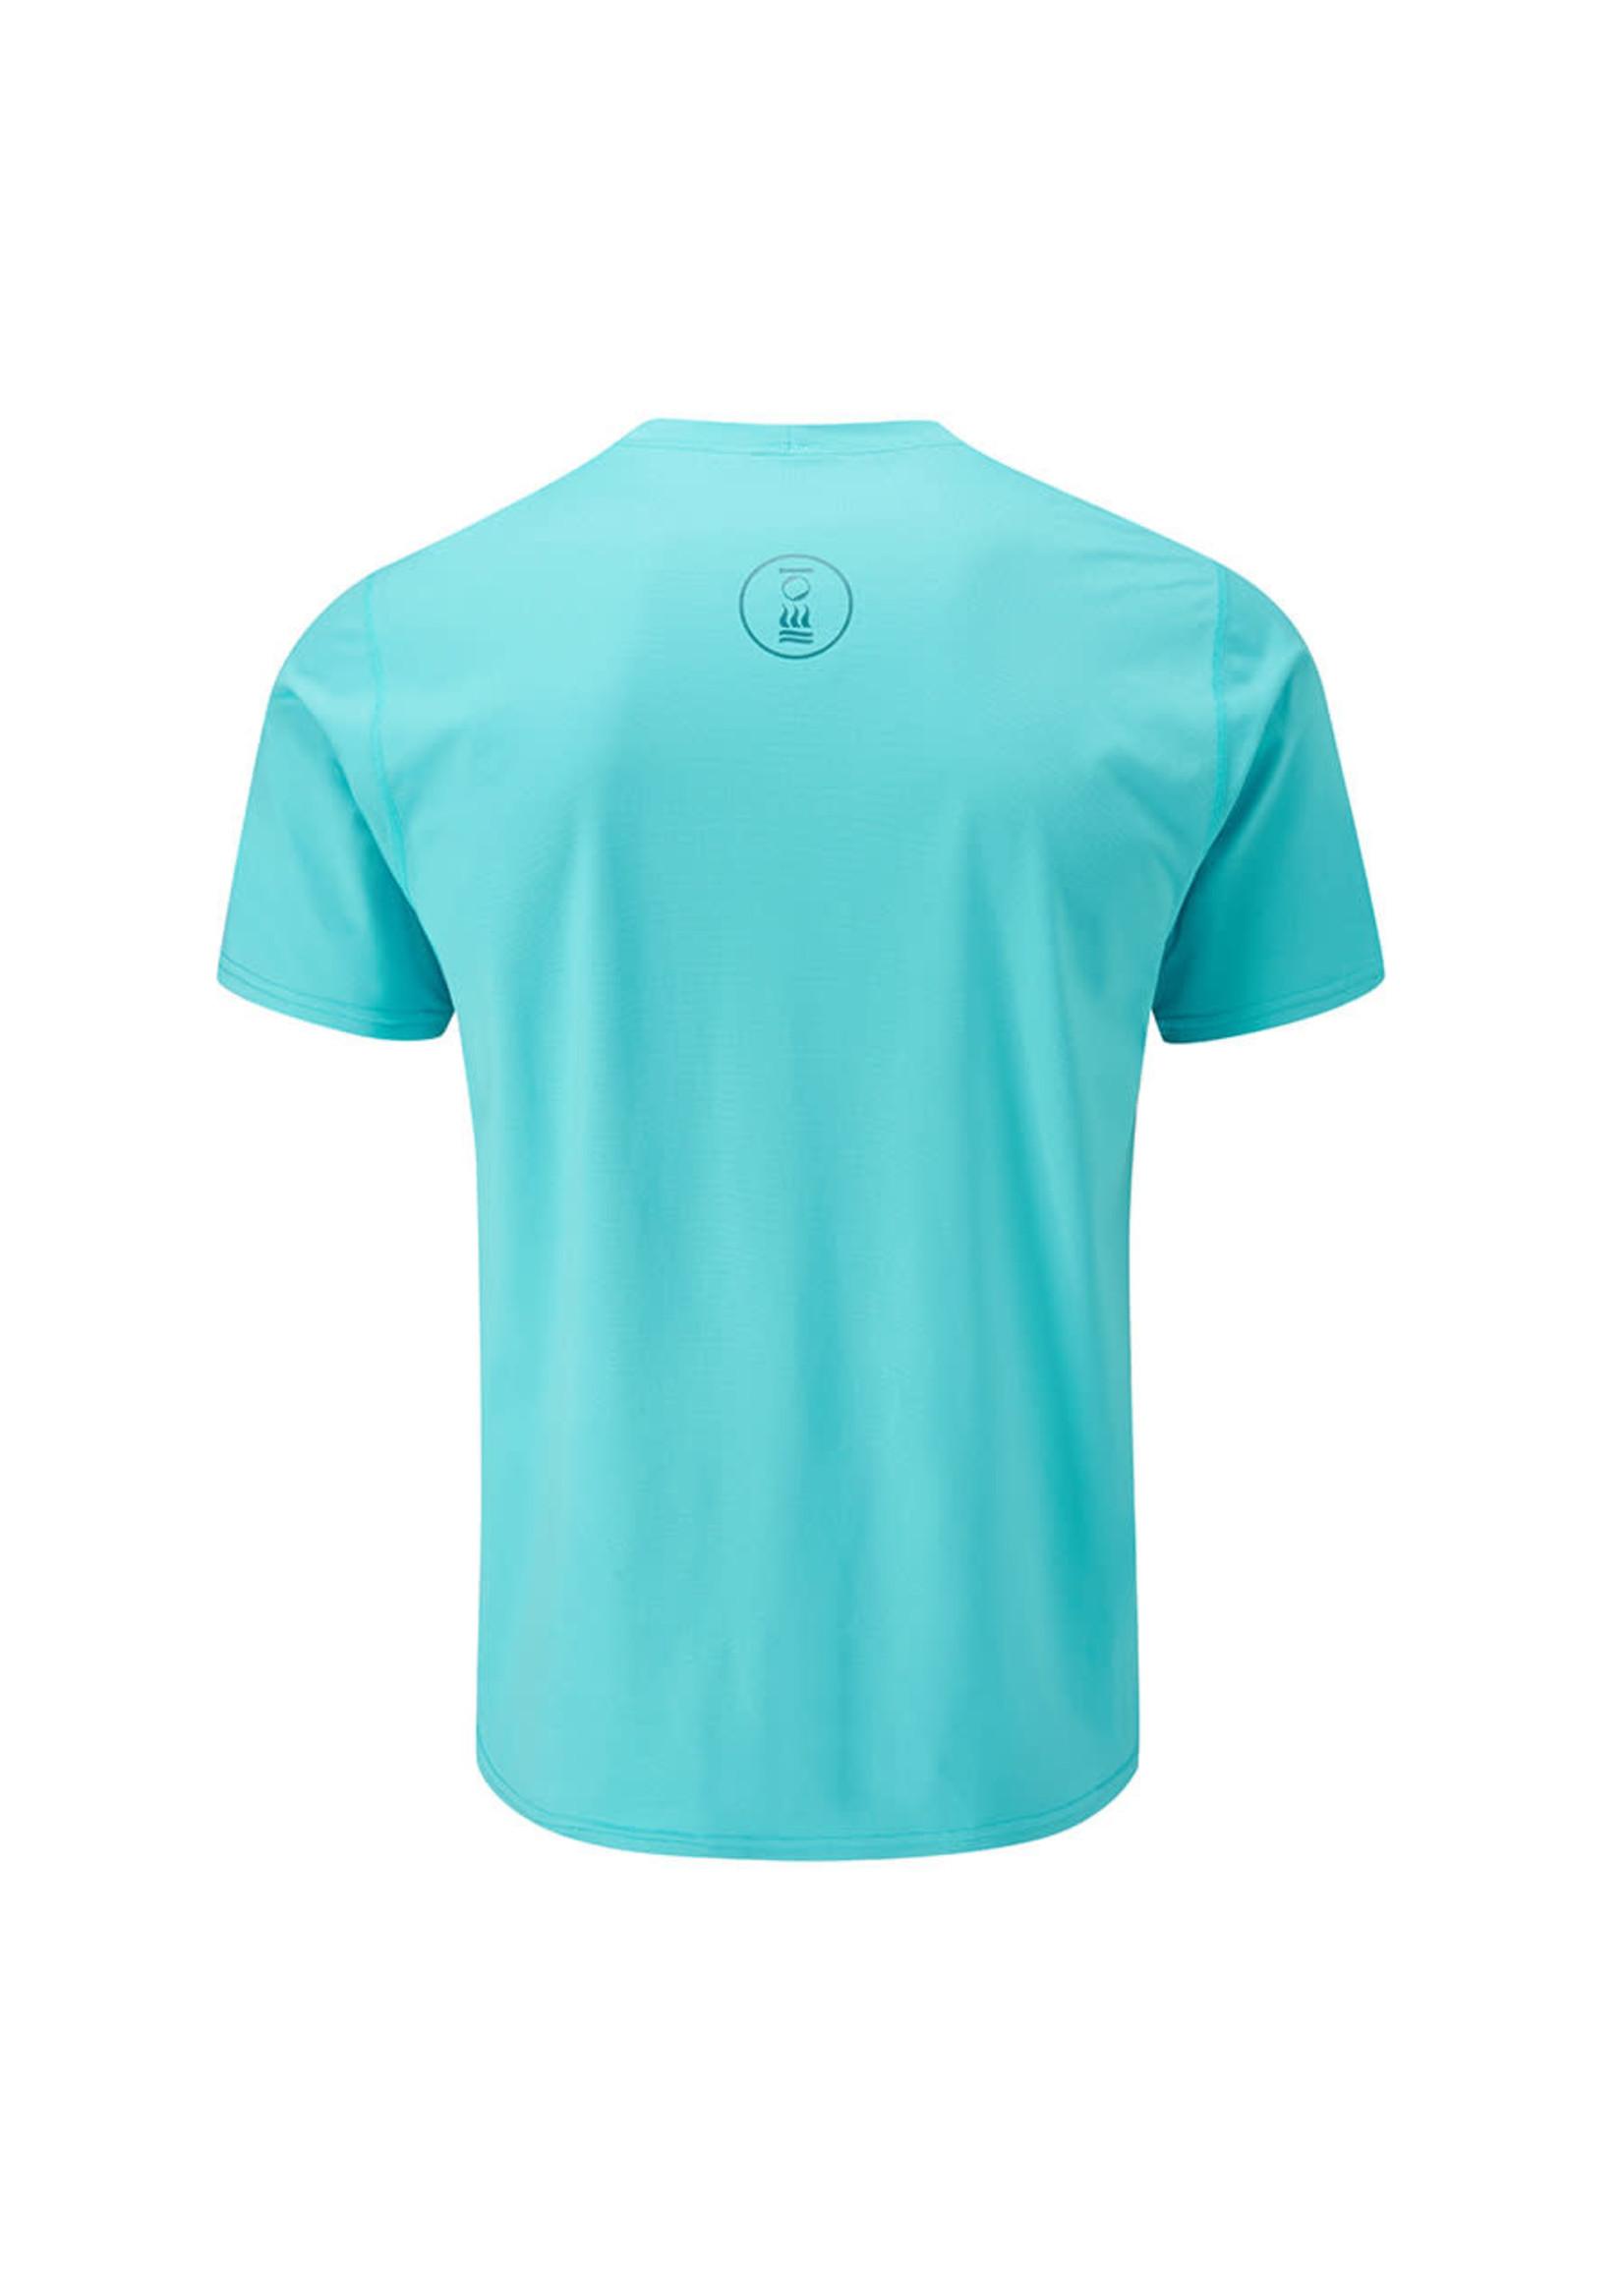 Fourth Element Fourth Element Hydro-T Short Sleeve Azure Blue - man